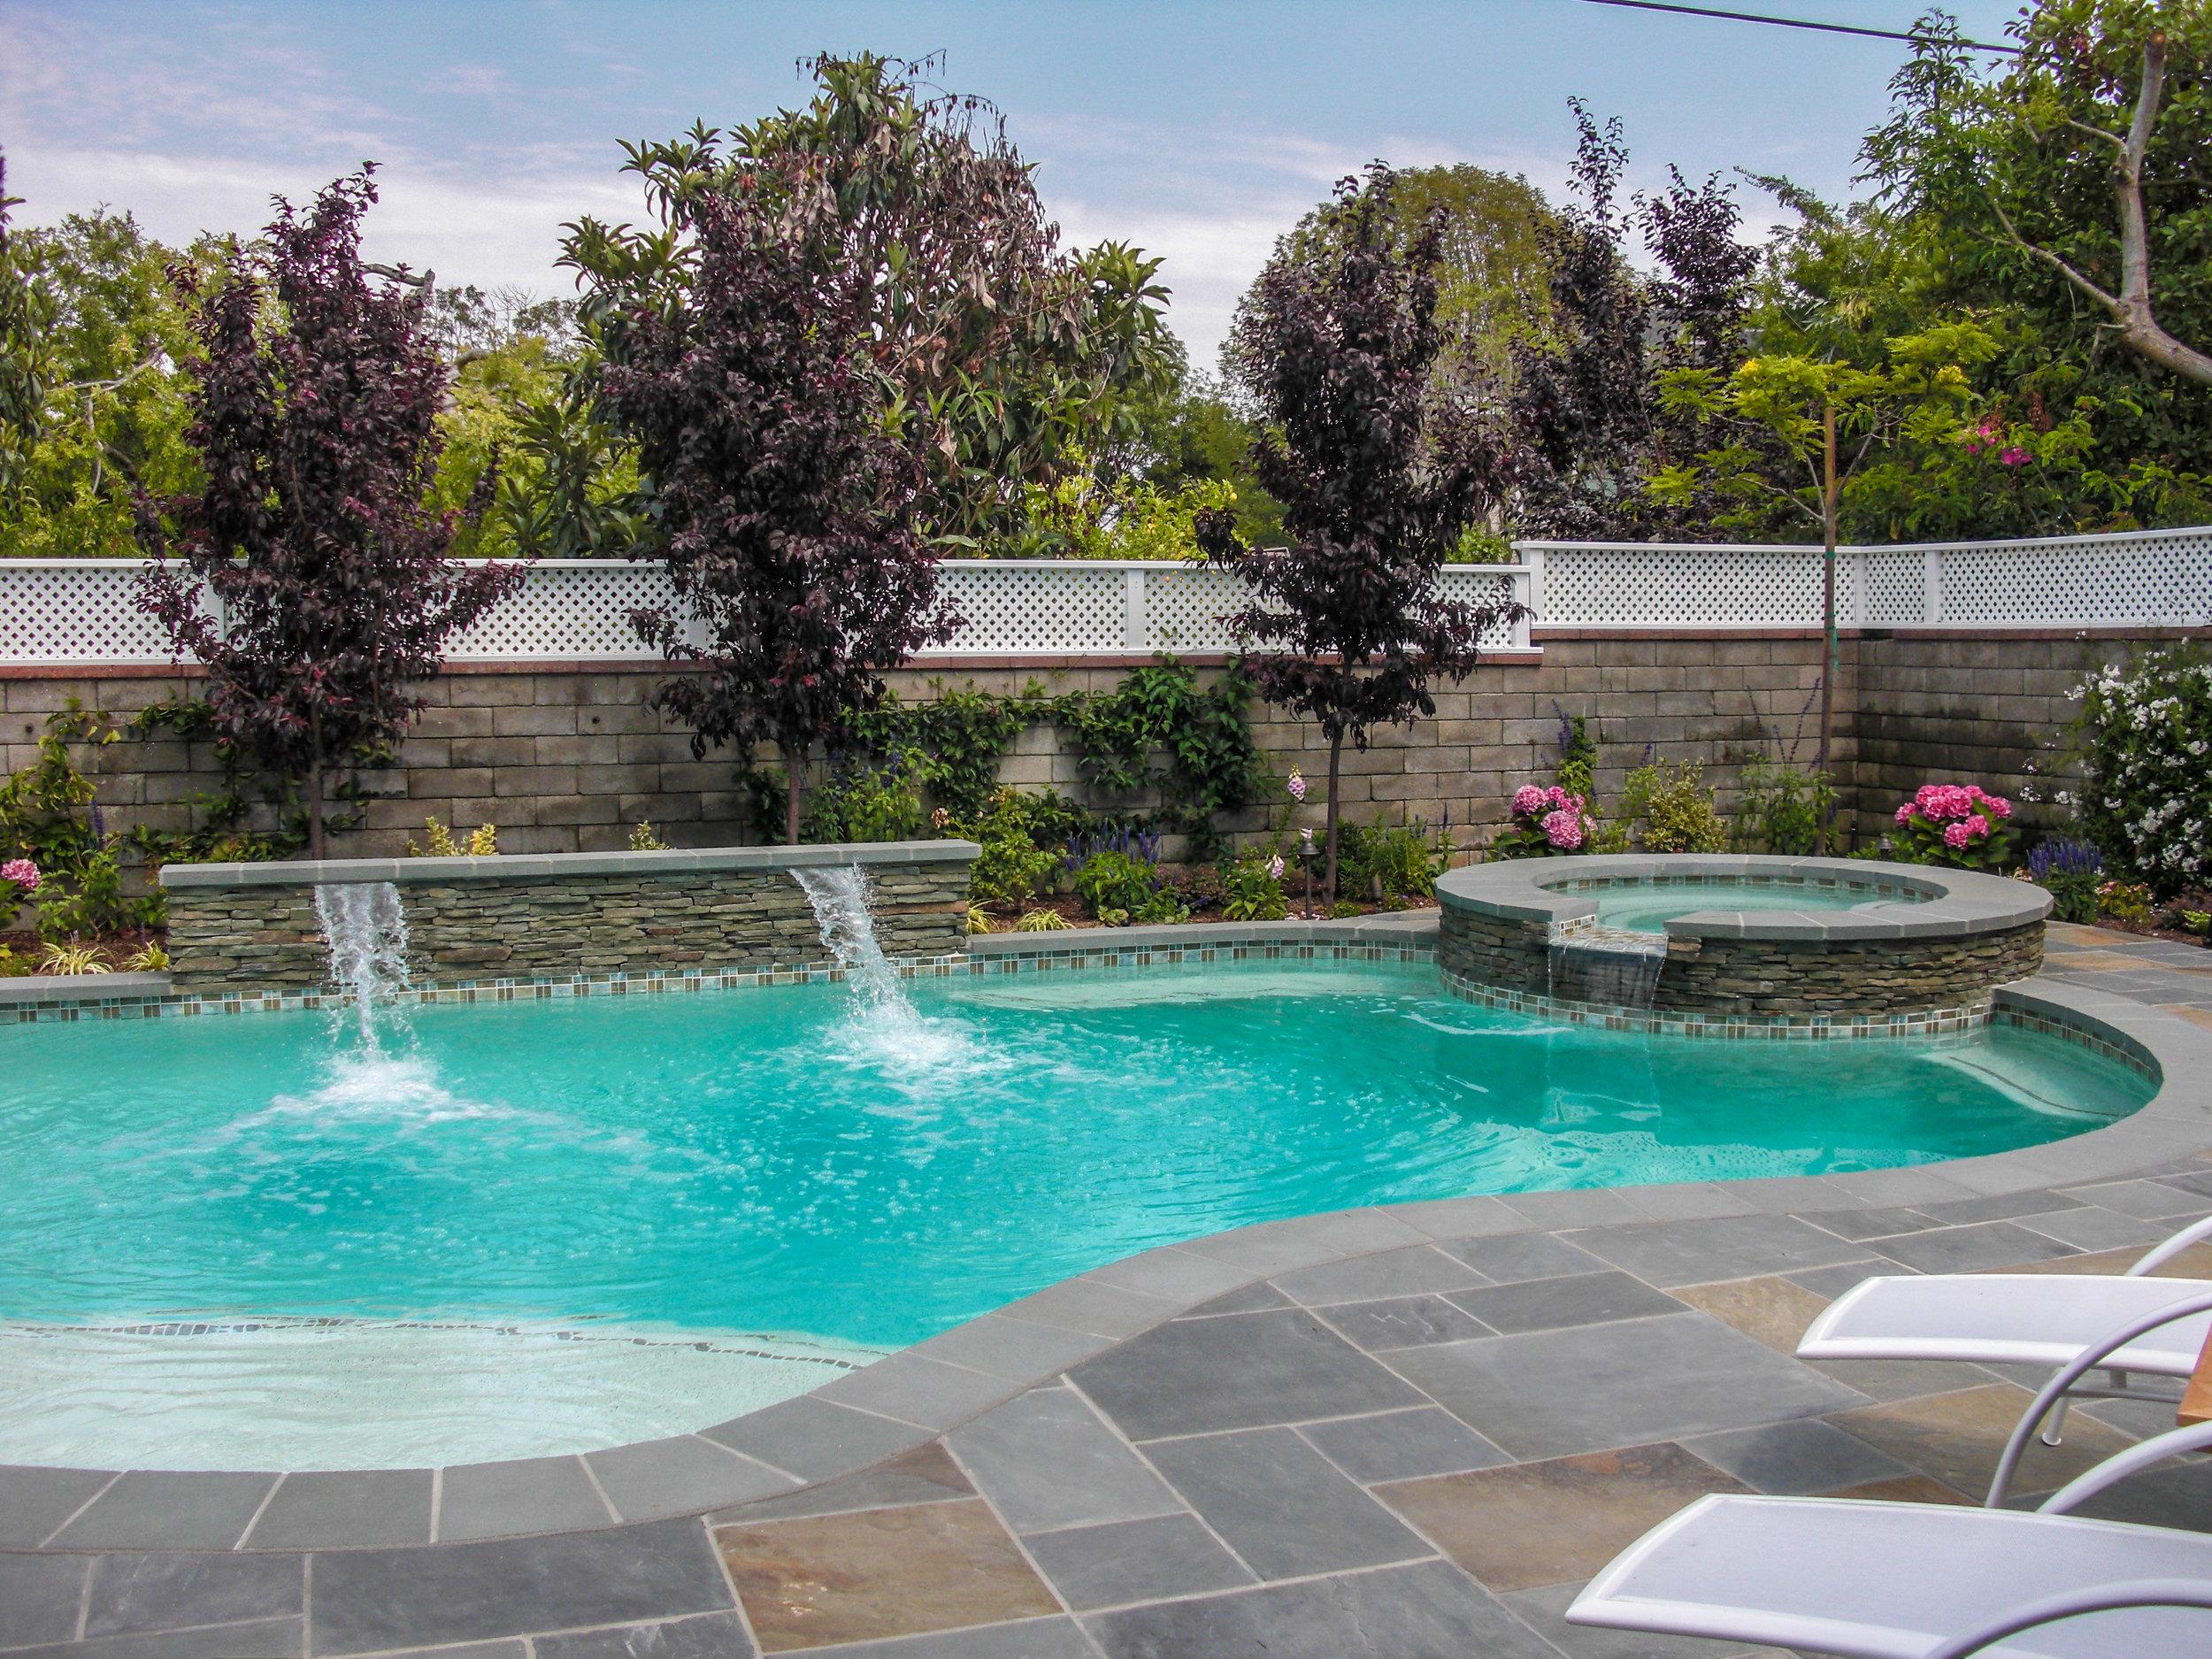 Burdick pool 031.jpg